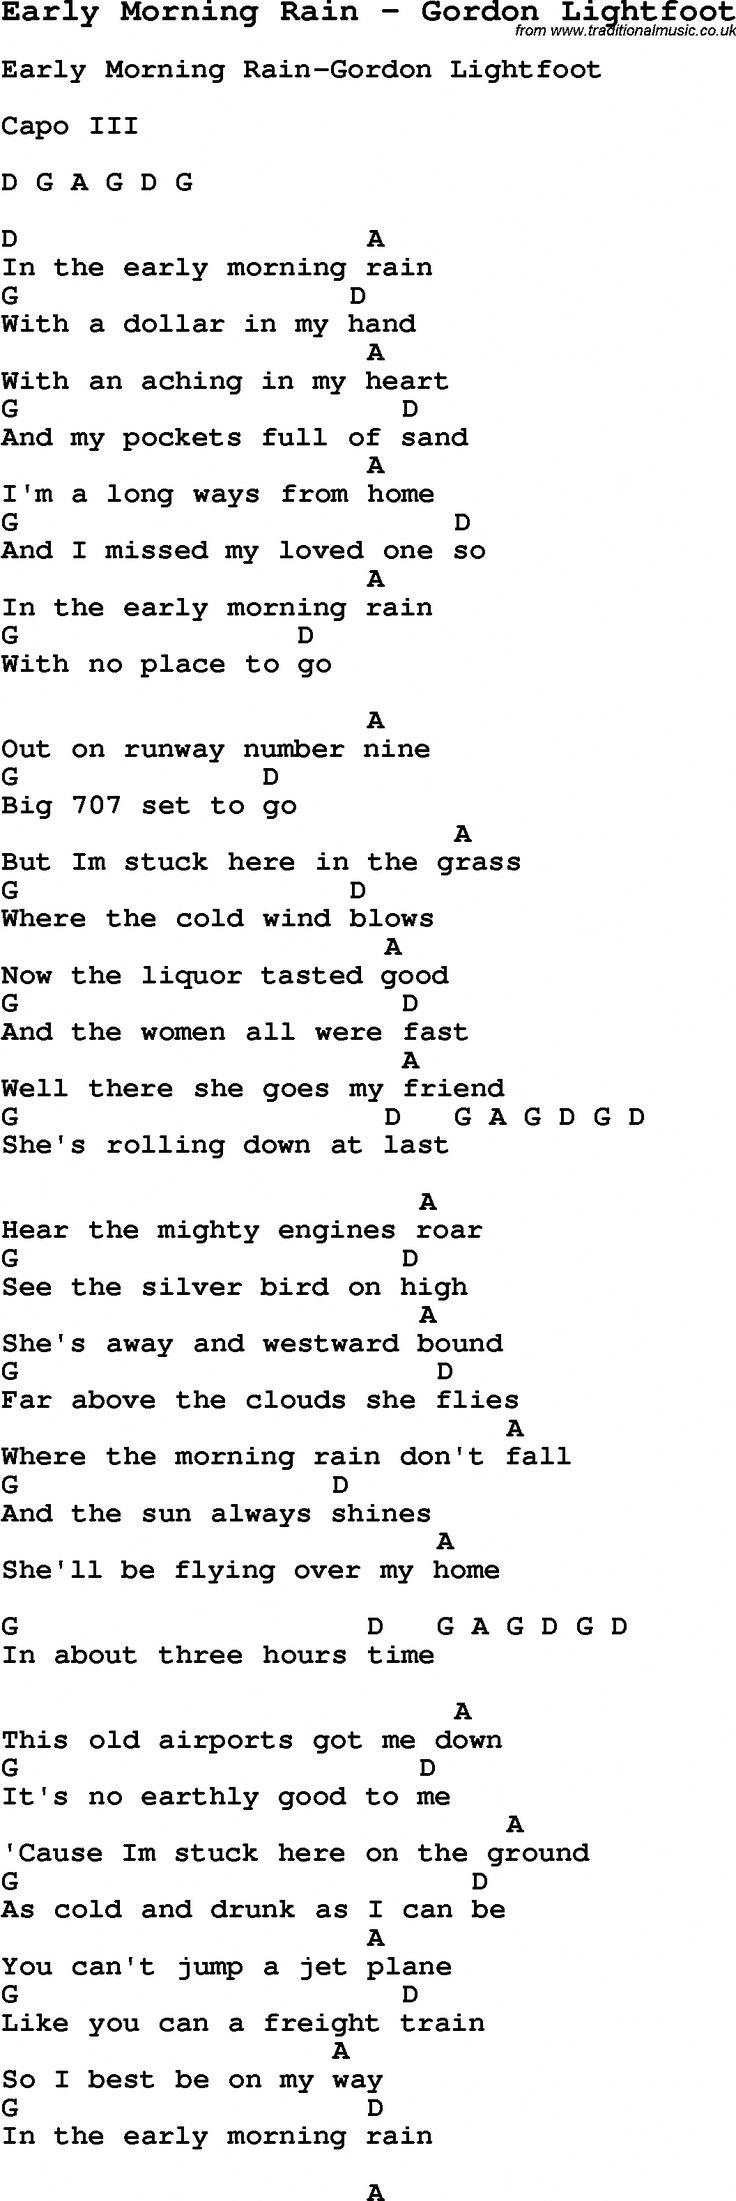 Song Early Morning Rain by Gordon Lightfoot, with lyrics